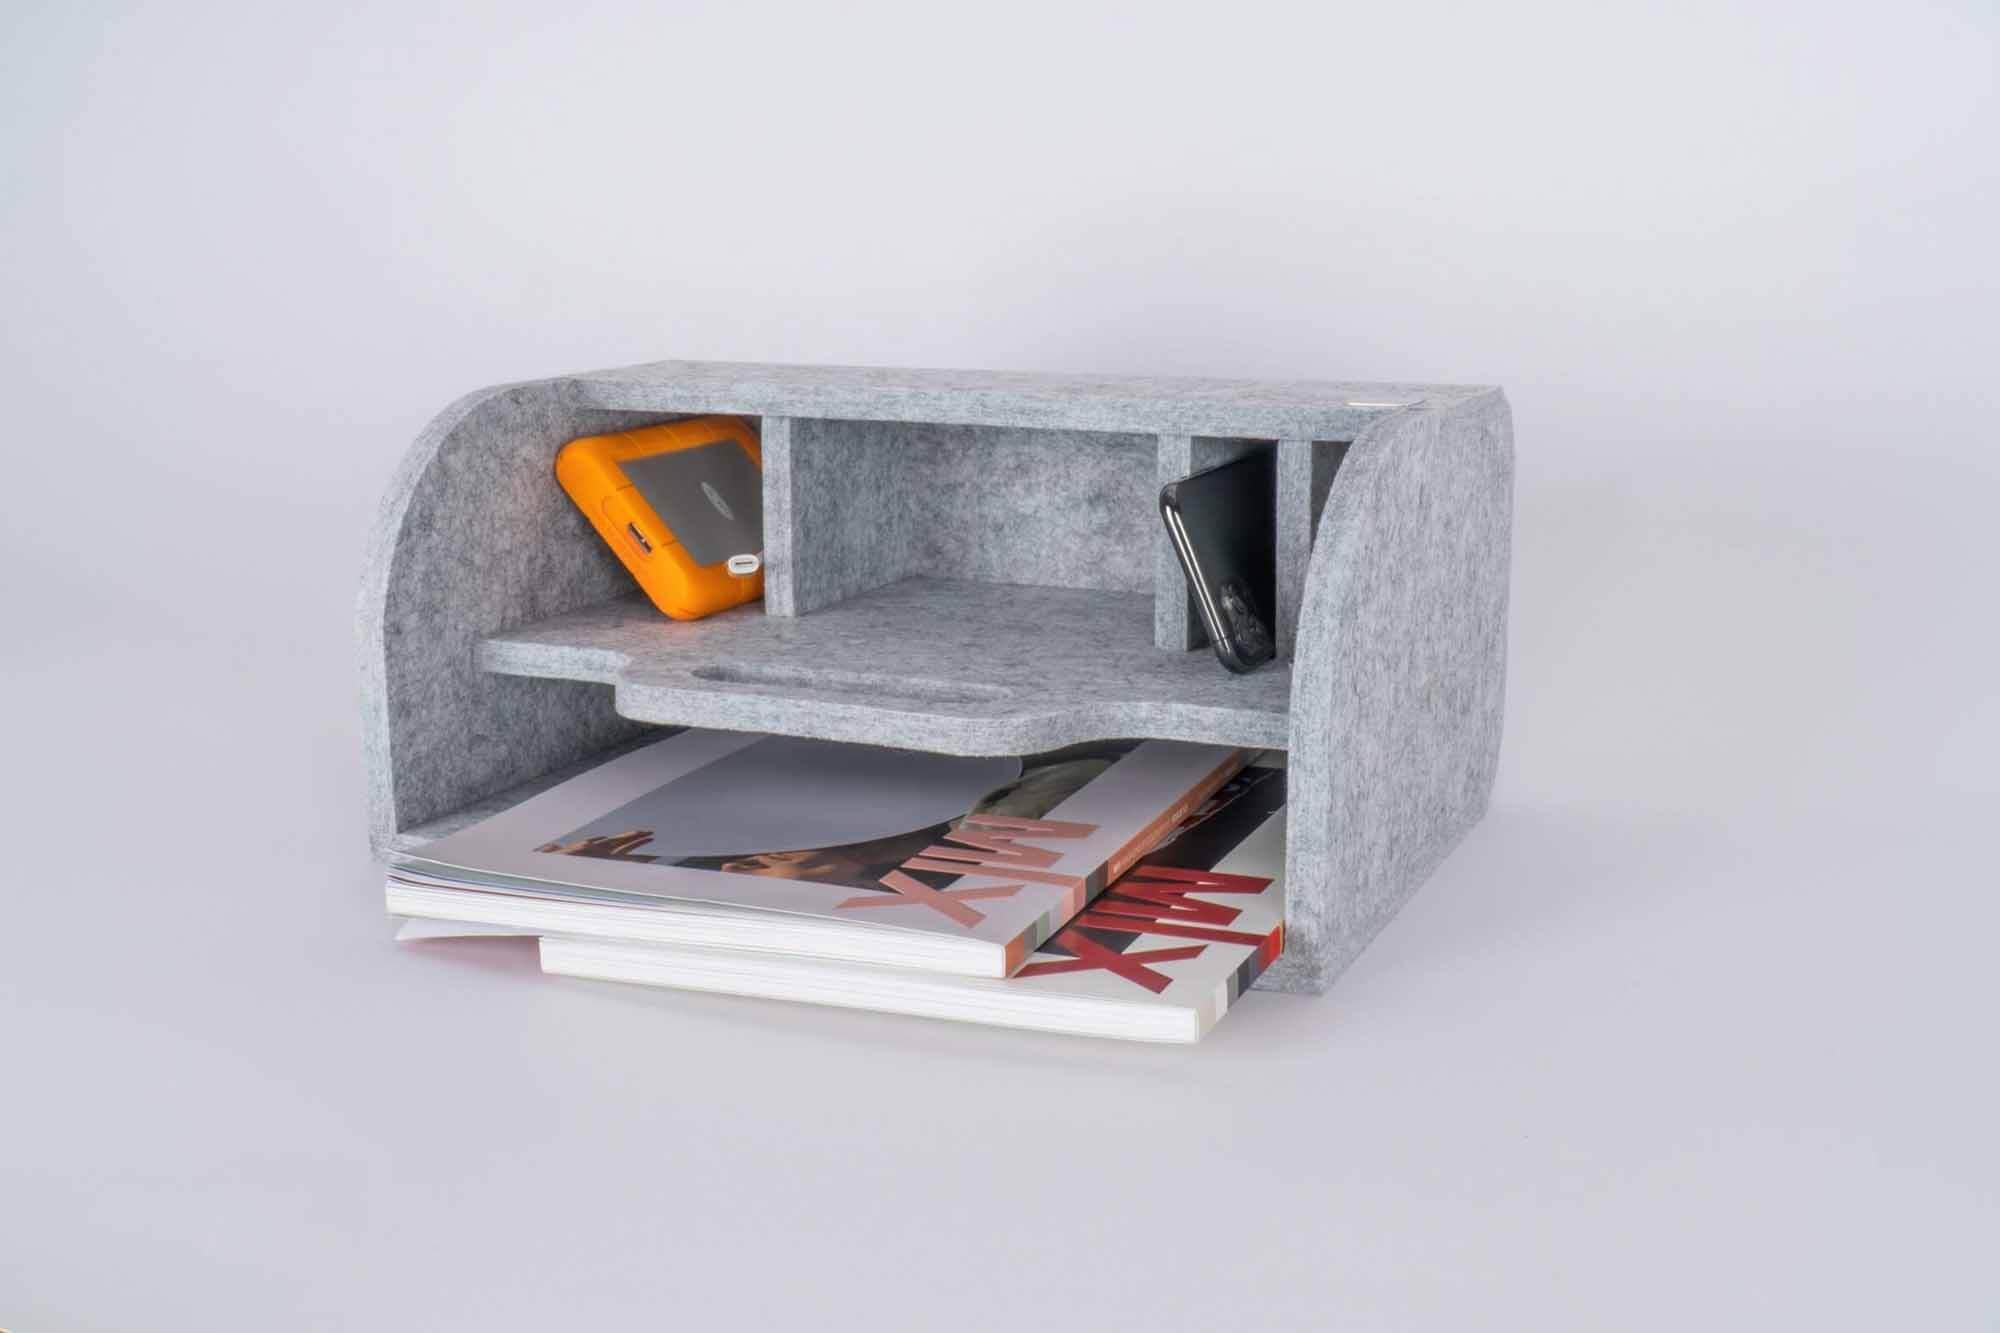 Акустический стол-органайзер TwoWay от Impact Acoustic